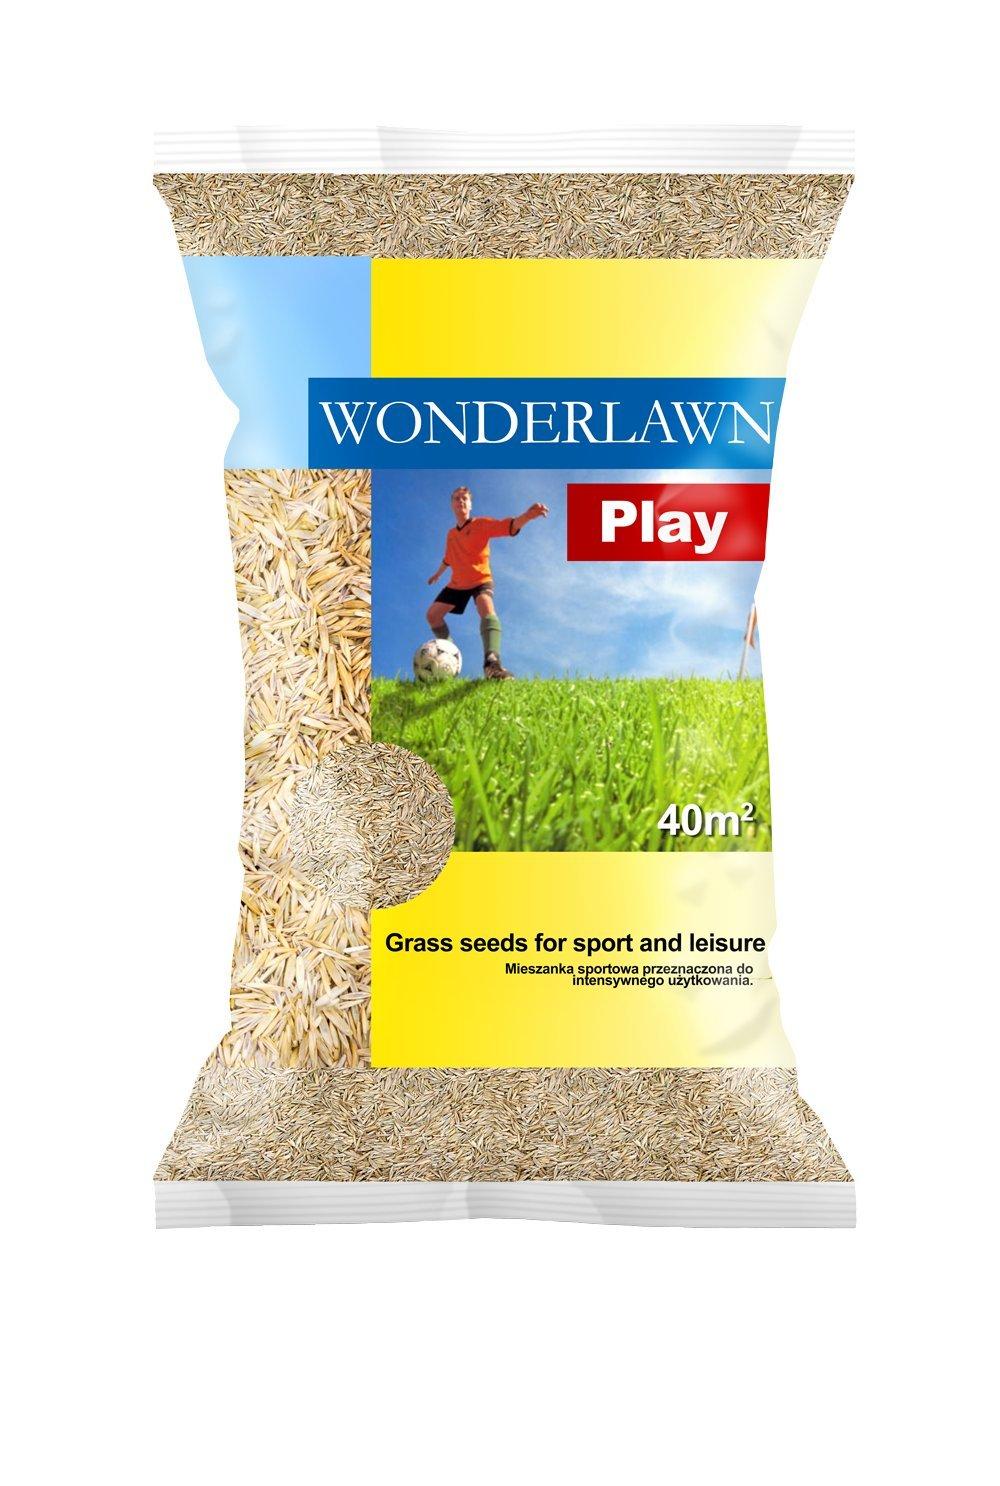 Barenbrug Wonderlawn Play 30kg Sportrasen Spielrasen Rasensamen Grassamen Rasensaat